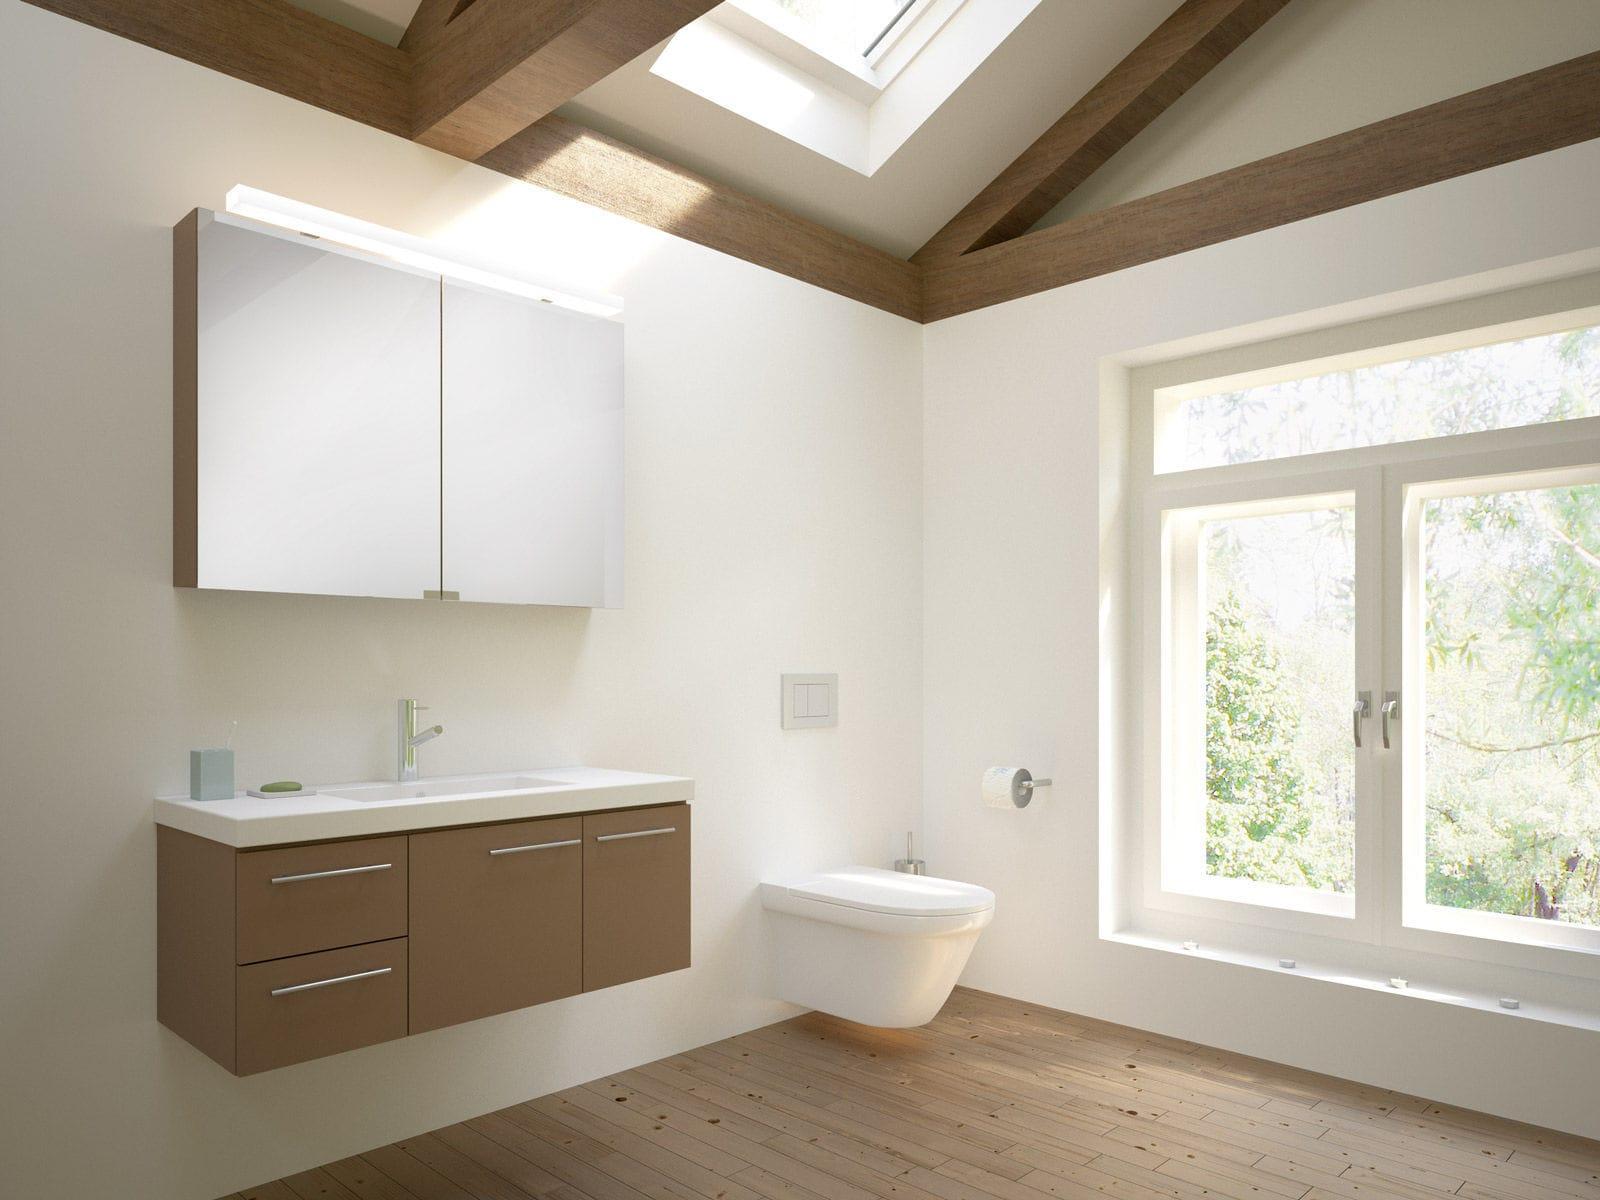 Hängend-Waschtischunterschrank / Holz / modern / mit Spiegel ... | {Waschtischunterschrank holz 76}